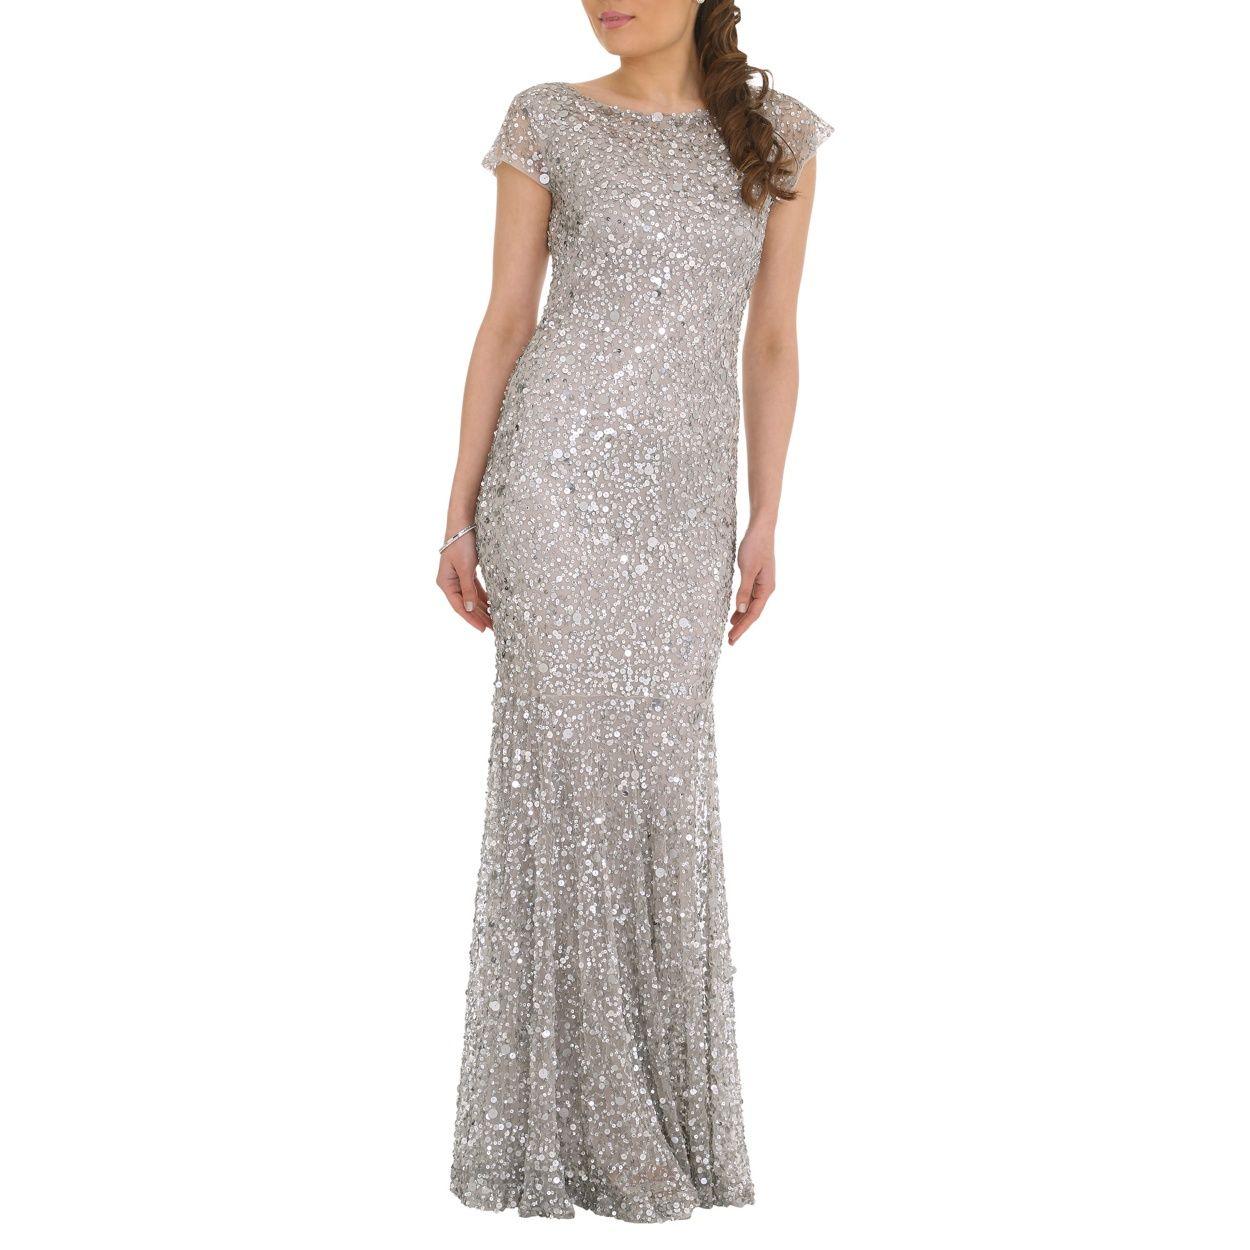 Rubyray Silver All Over Bead Dress At Debenhams